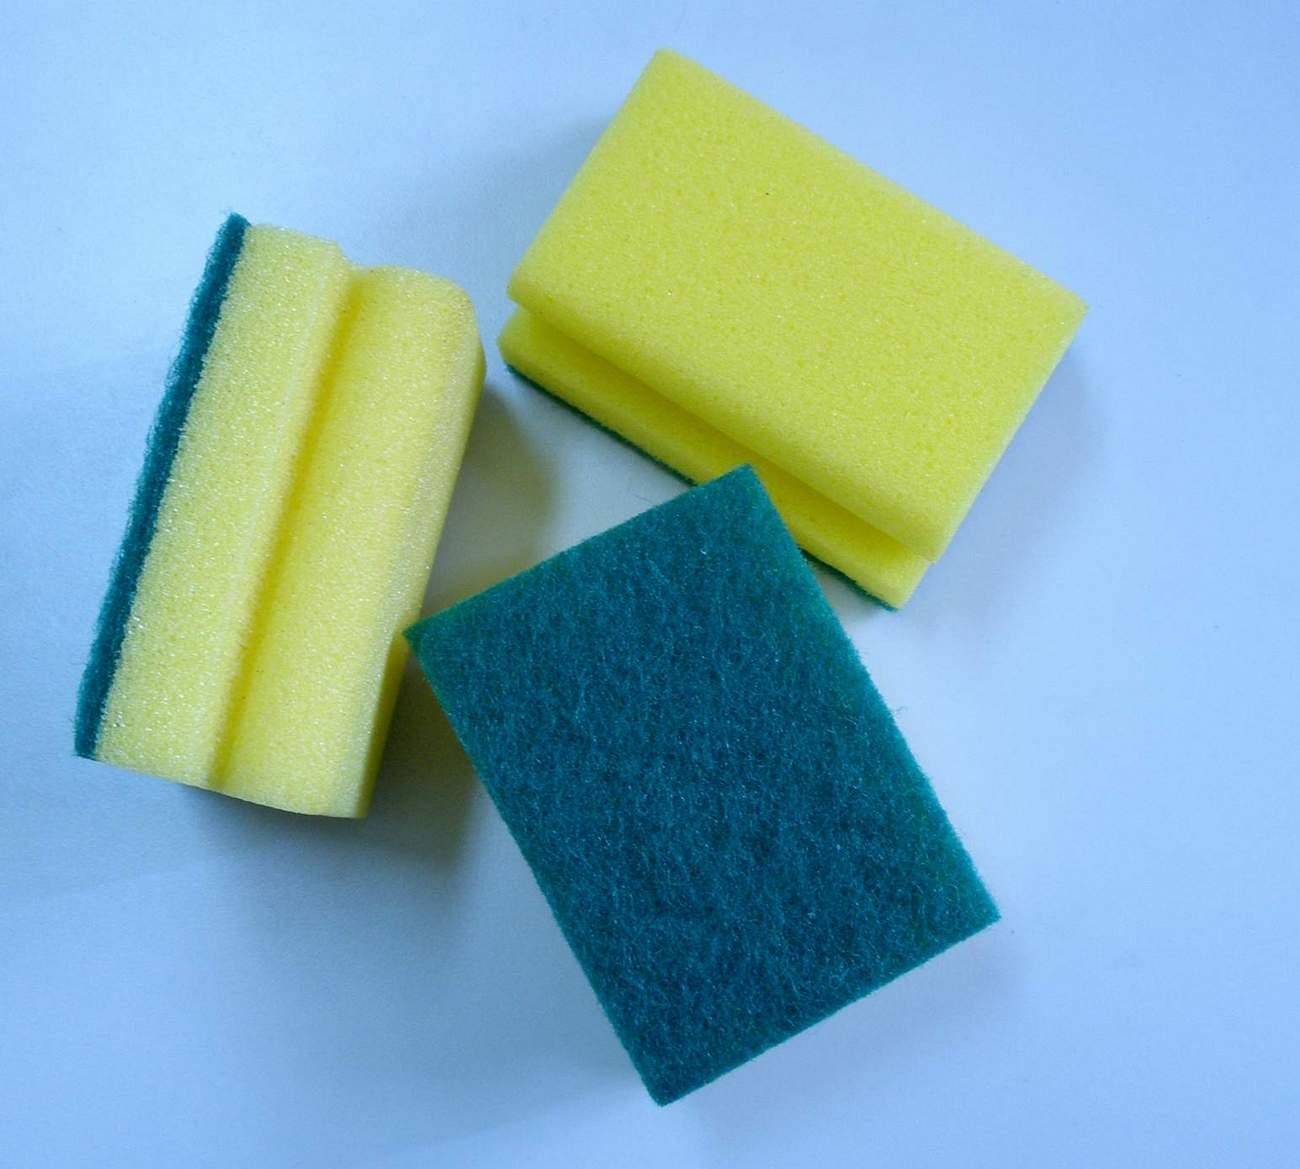 Sponge cleaning  pad